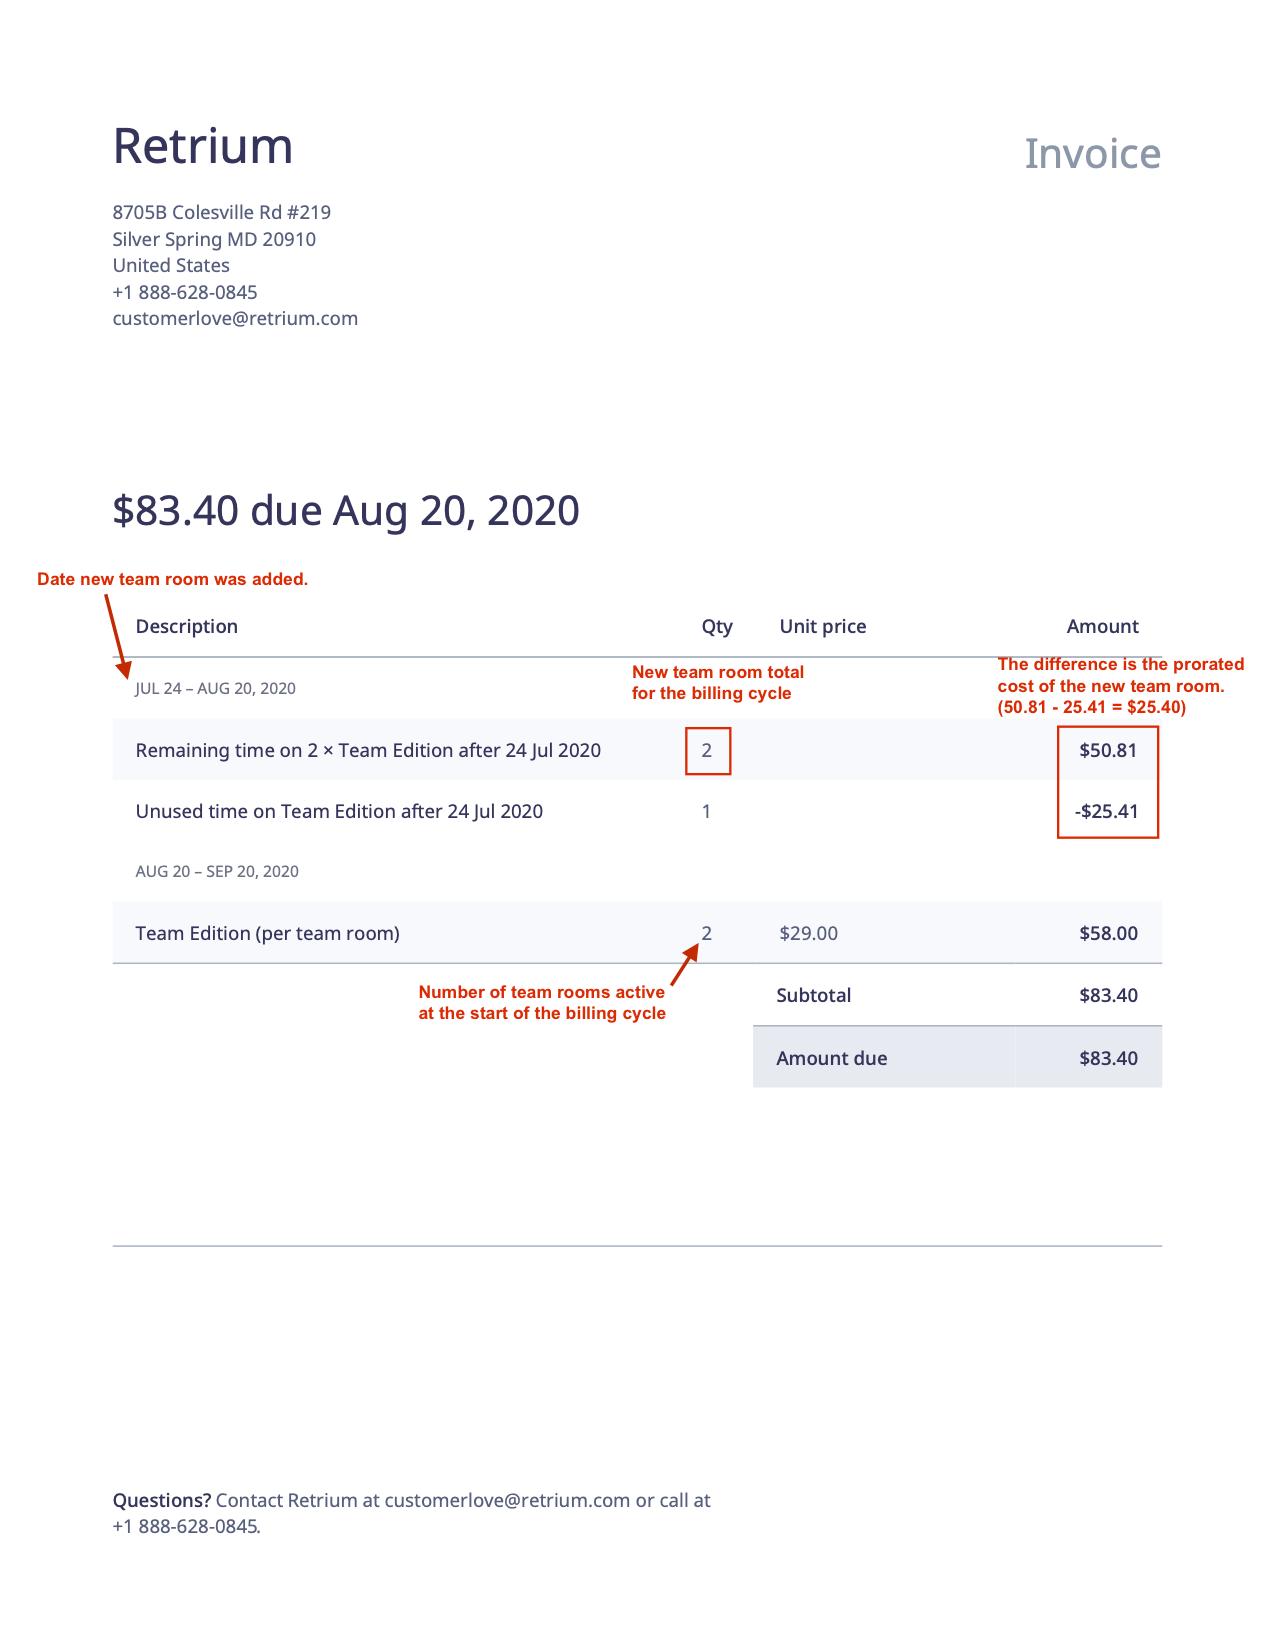 a picture of a retrium invoice